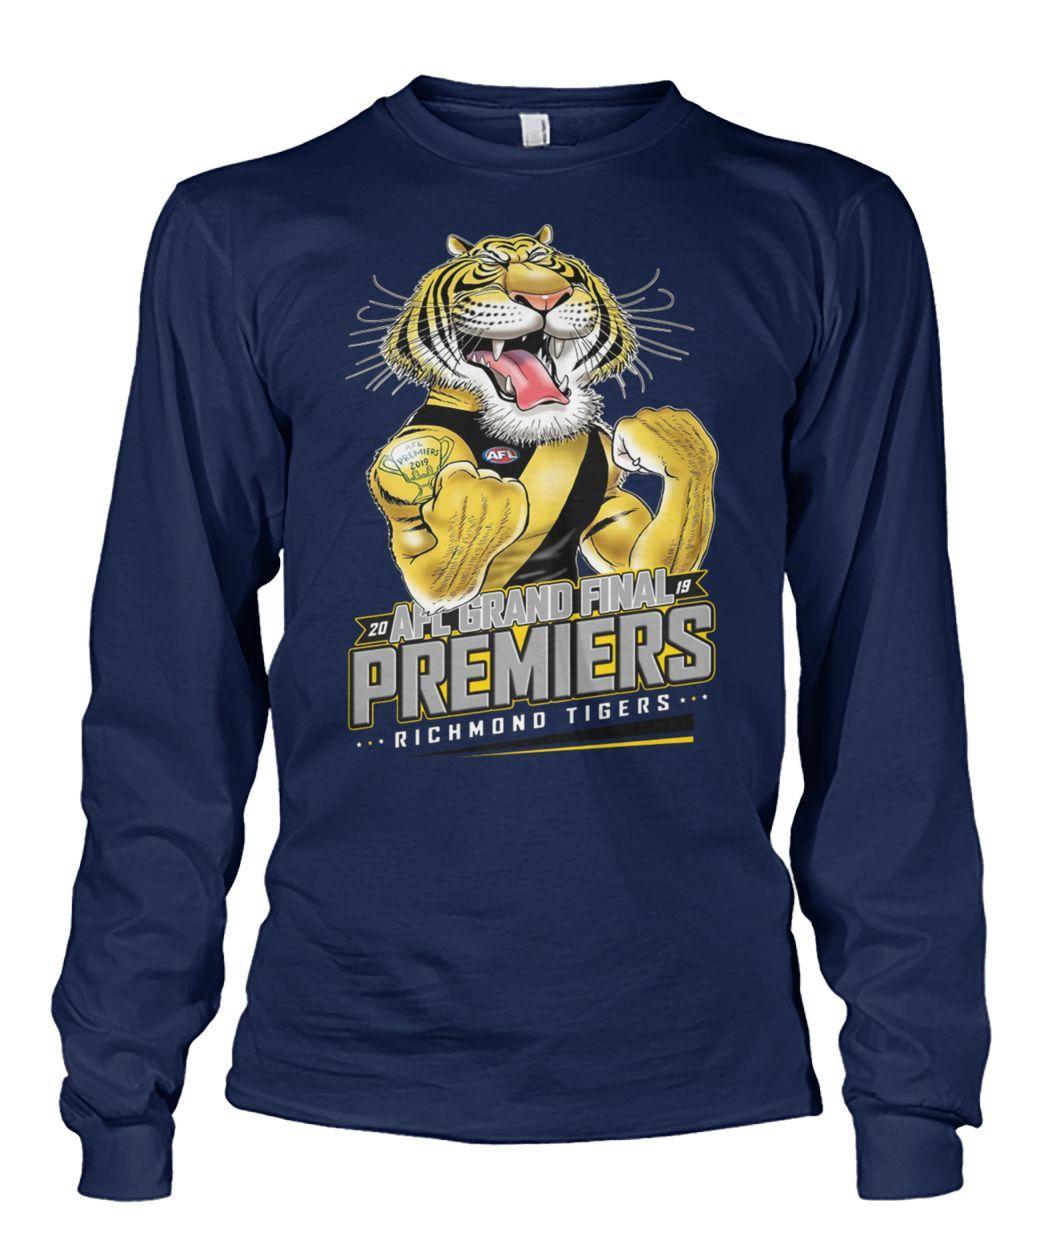 20 AFL grand final premiers richmond tigers long sleeve